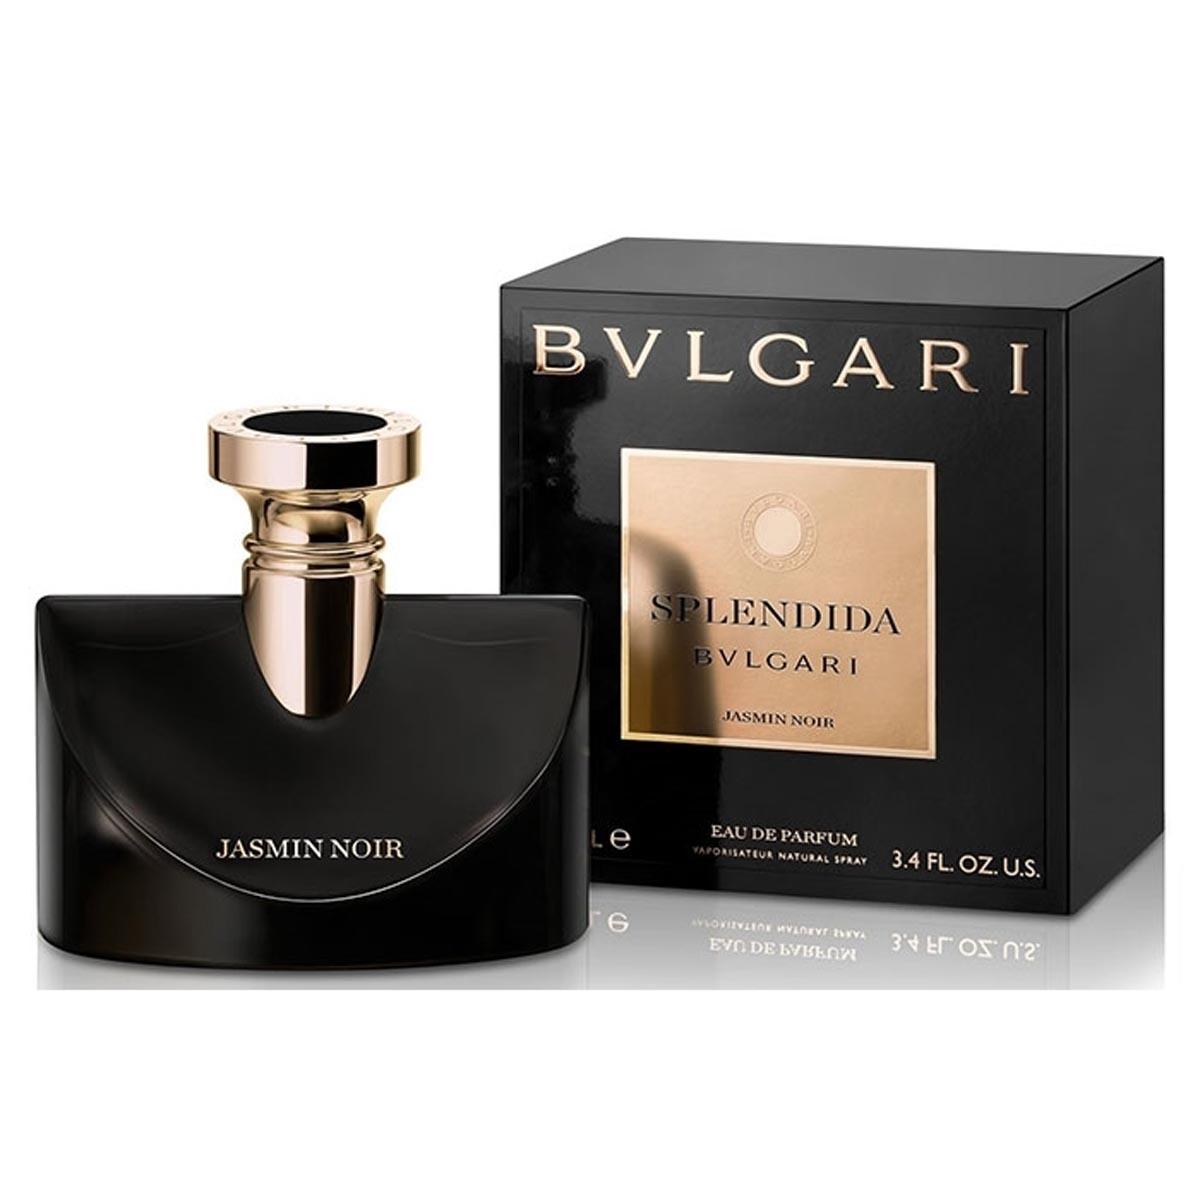 Bvlgari splendida jasmin noir eau de parfum 100ml vaporizador